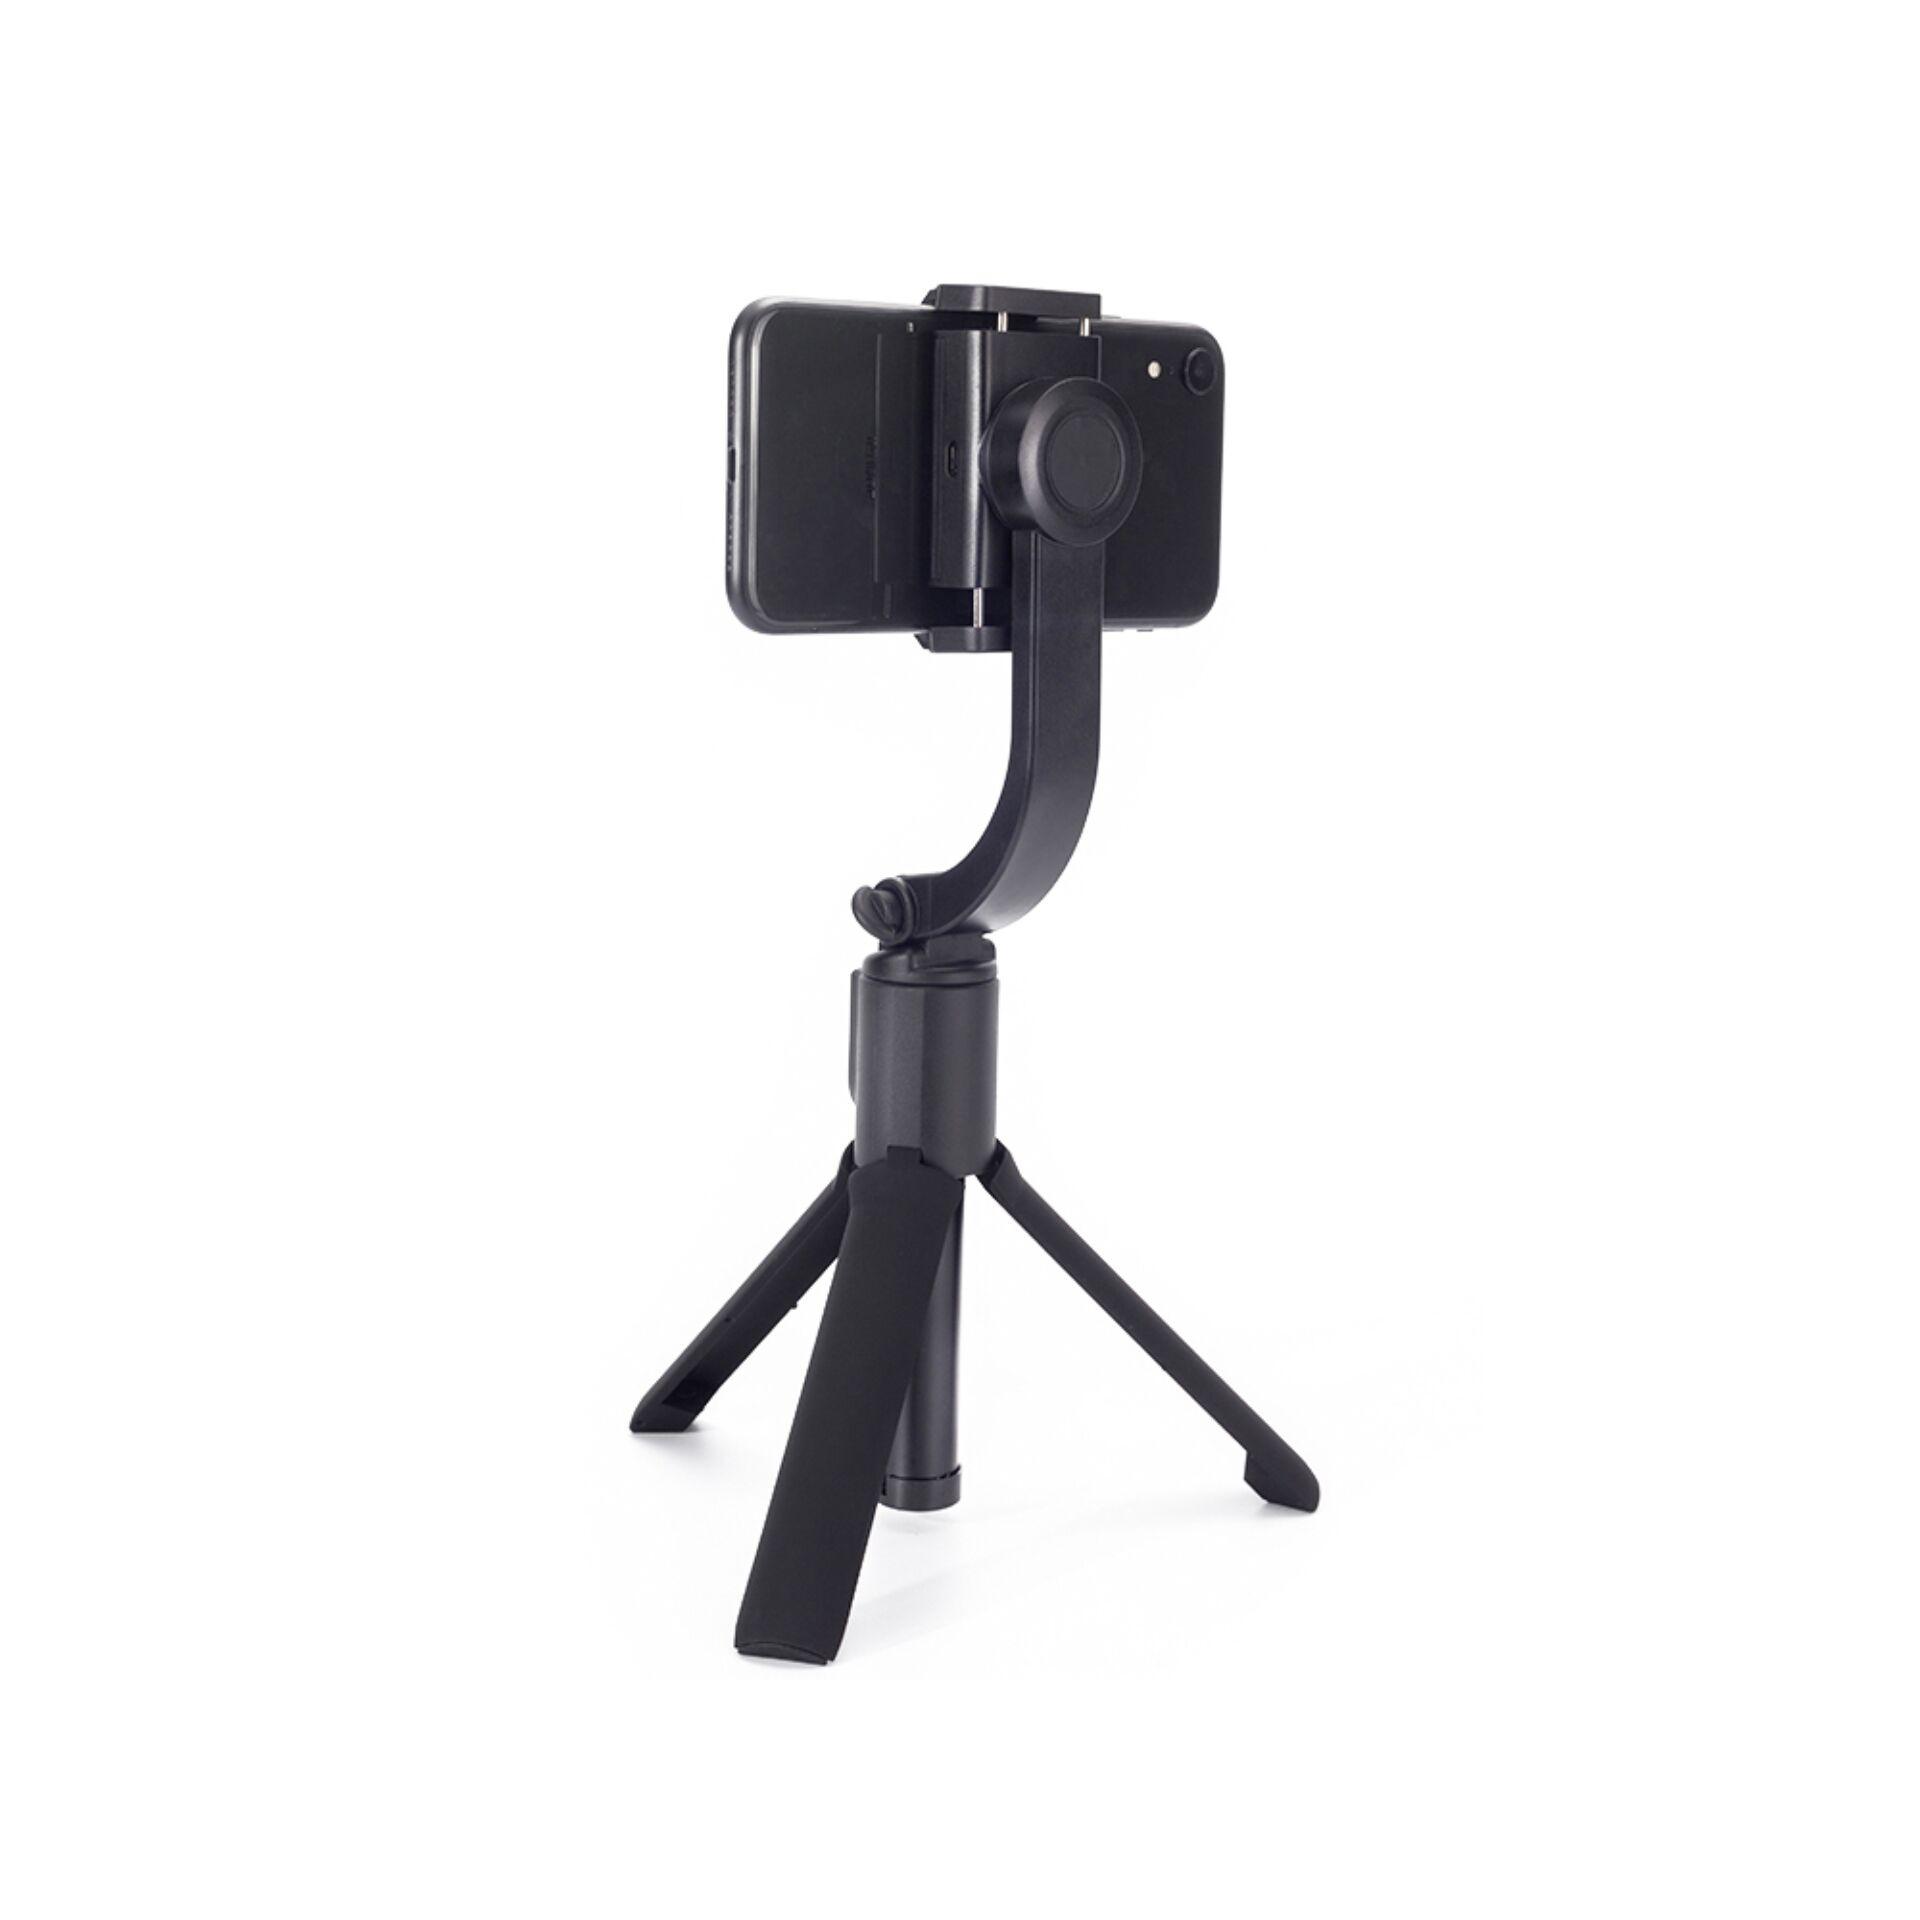 EasyPix GS1 1-AXIS Selfie Gimbal for Smartphone